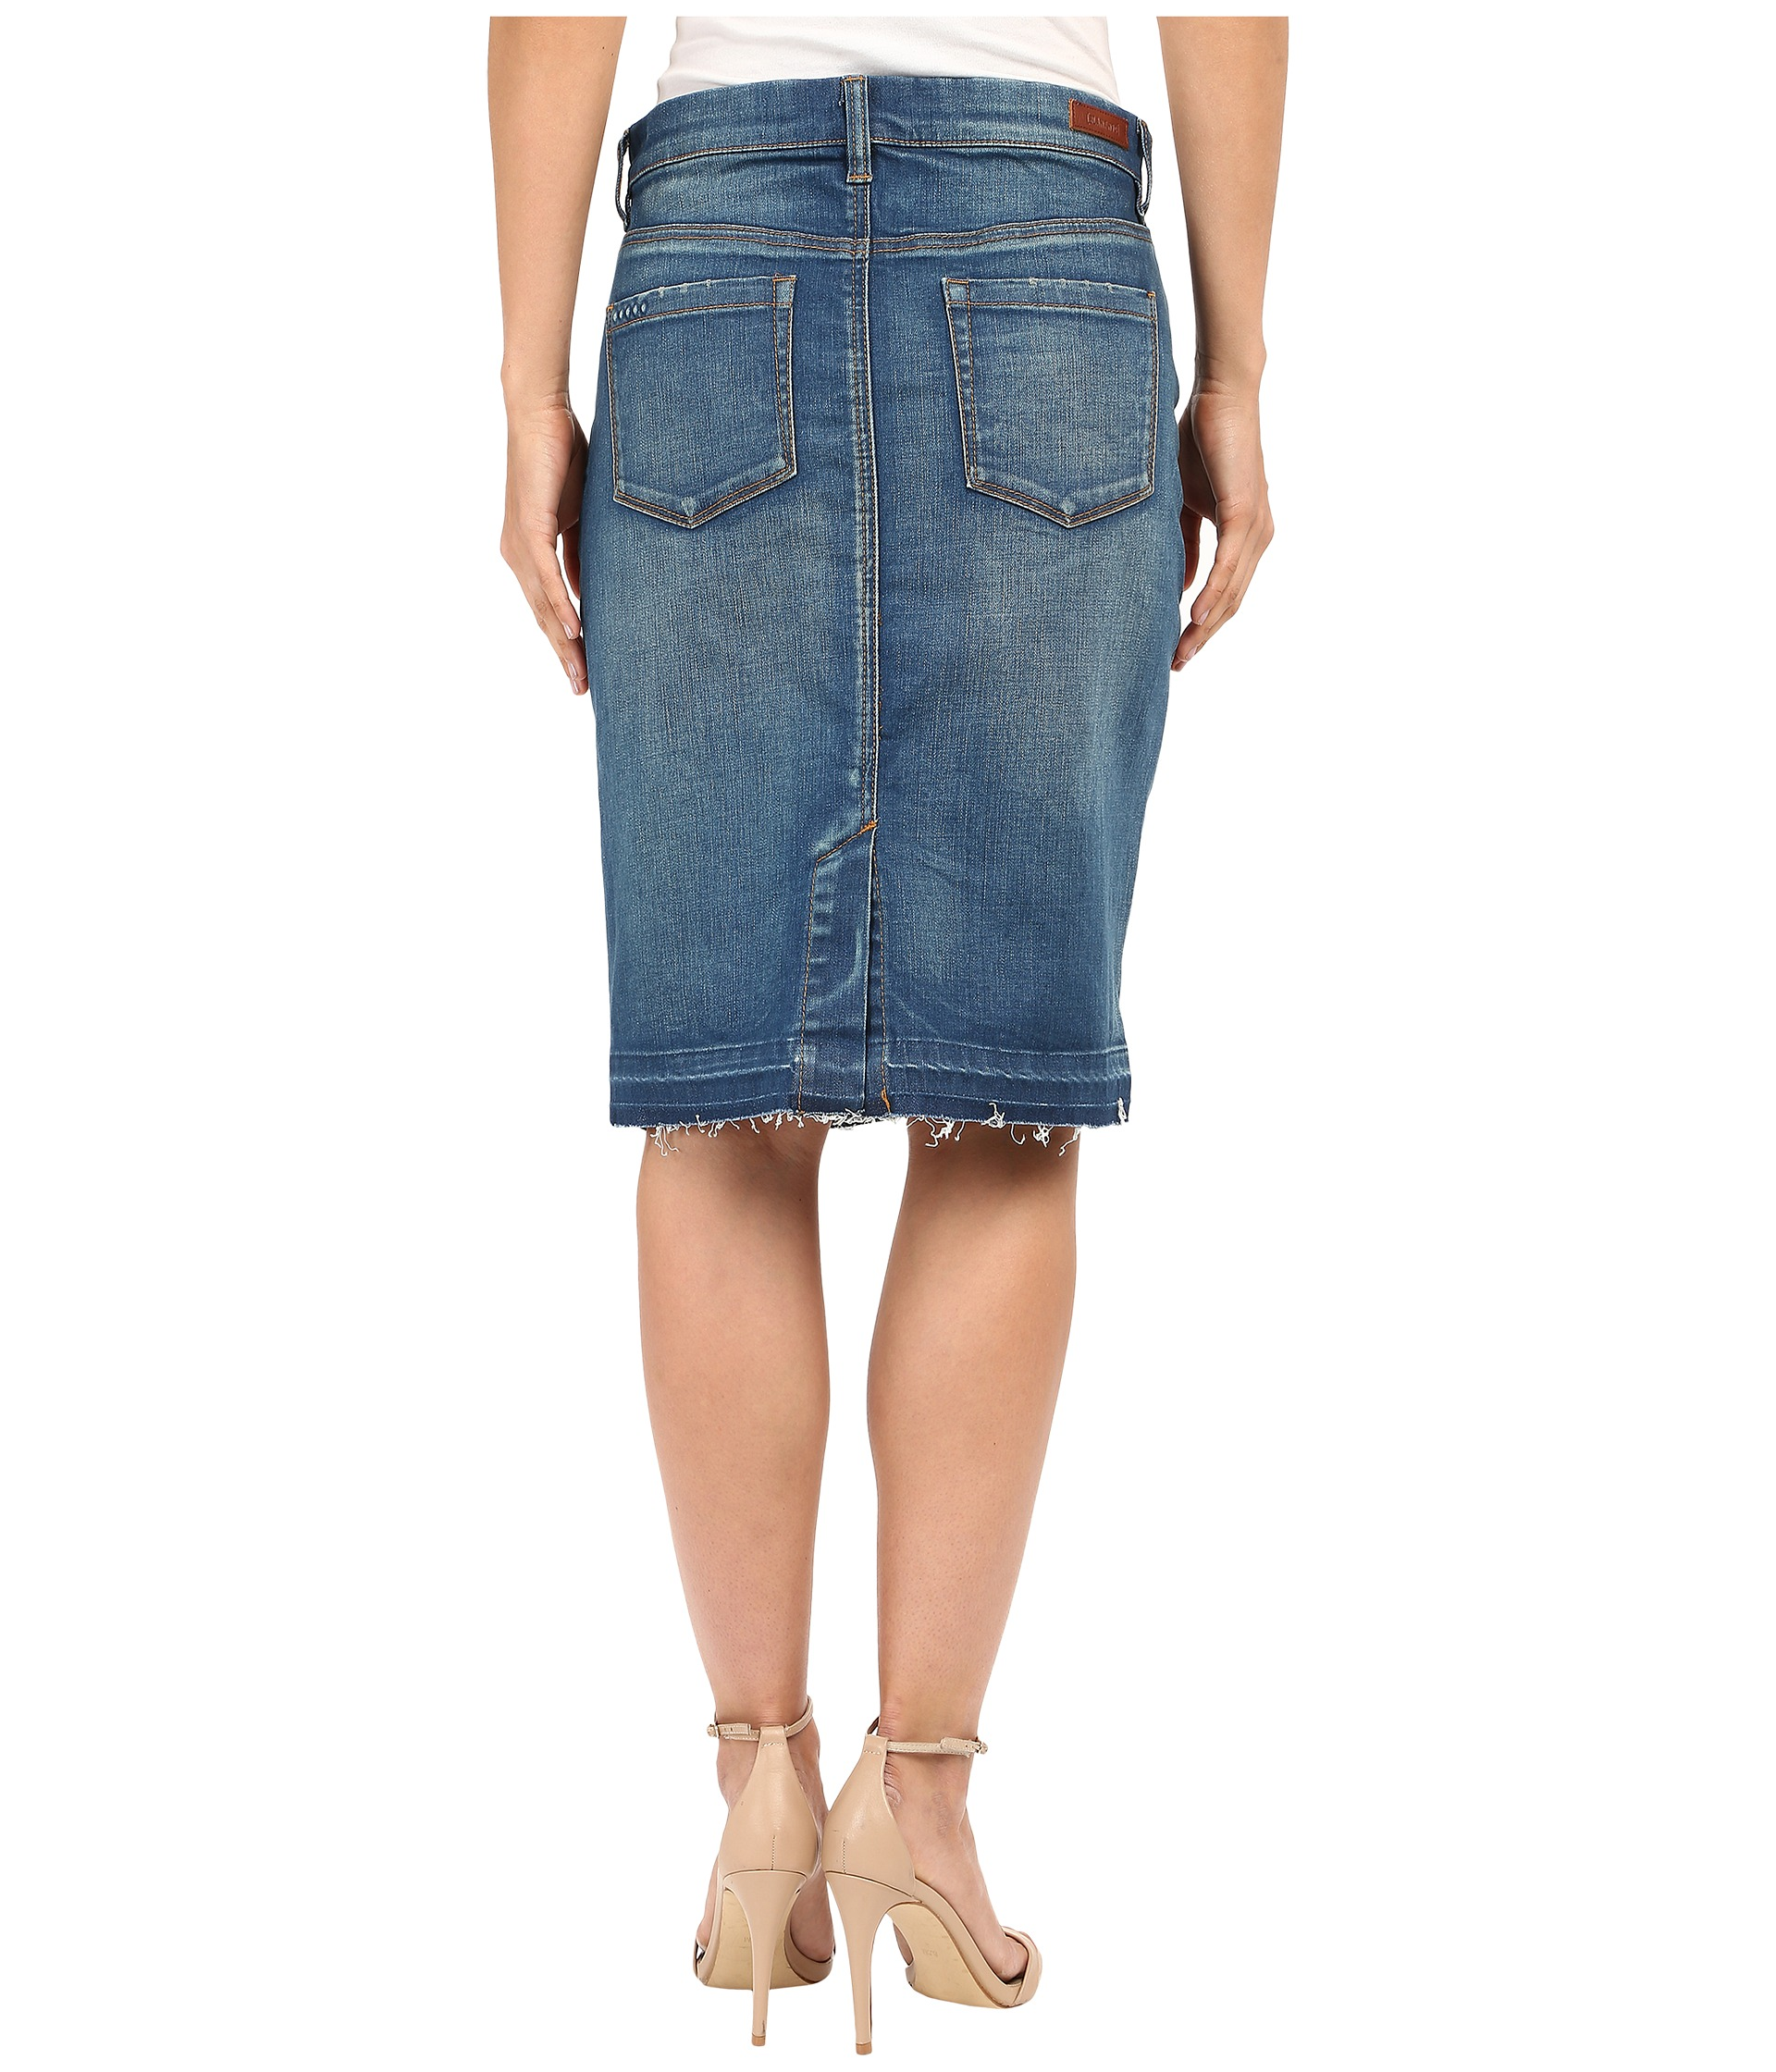 blank nyc denim pencil skirt denim blue zappos free